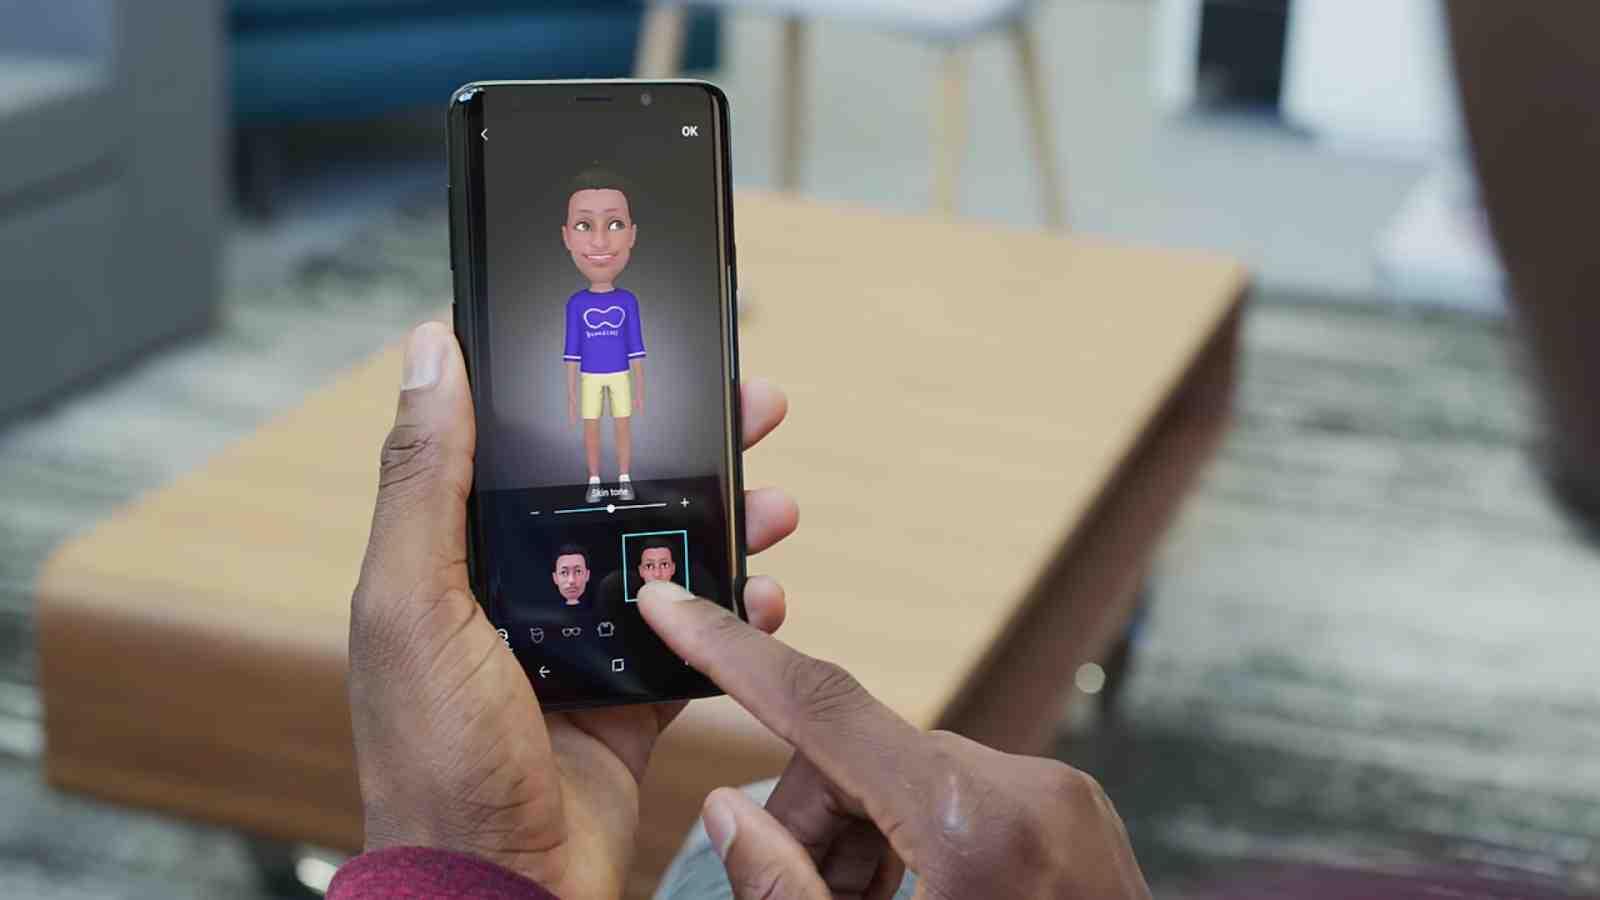 Samsung's AR Emoji